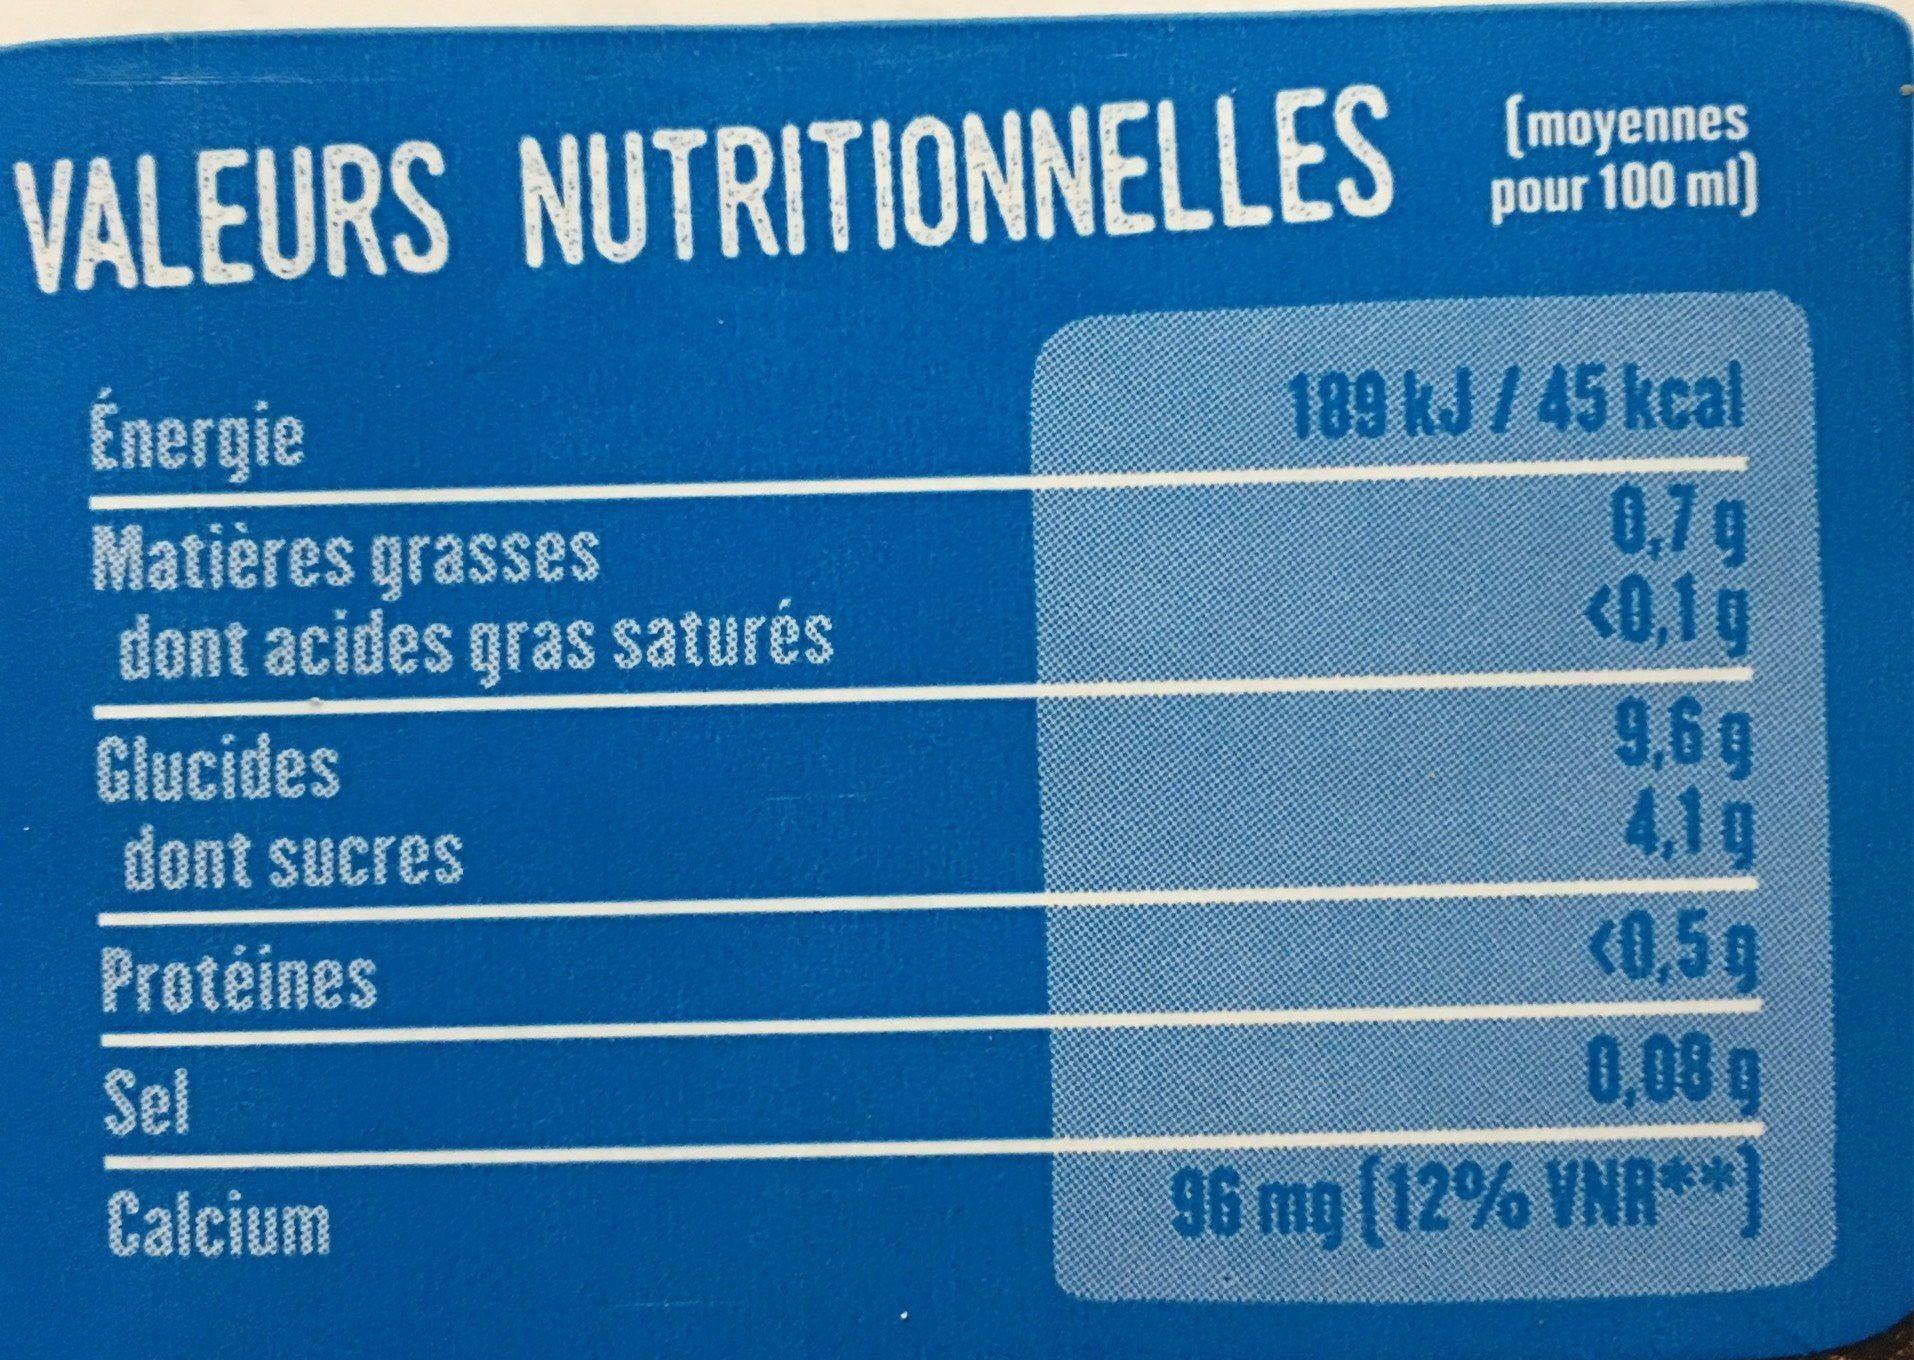 Boisson - Riz quinoa calcium - Nutrition facts - fr